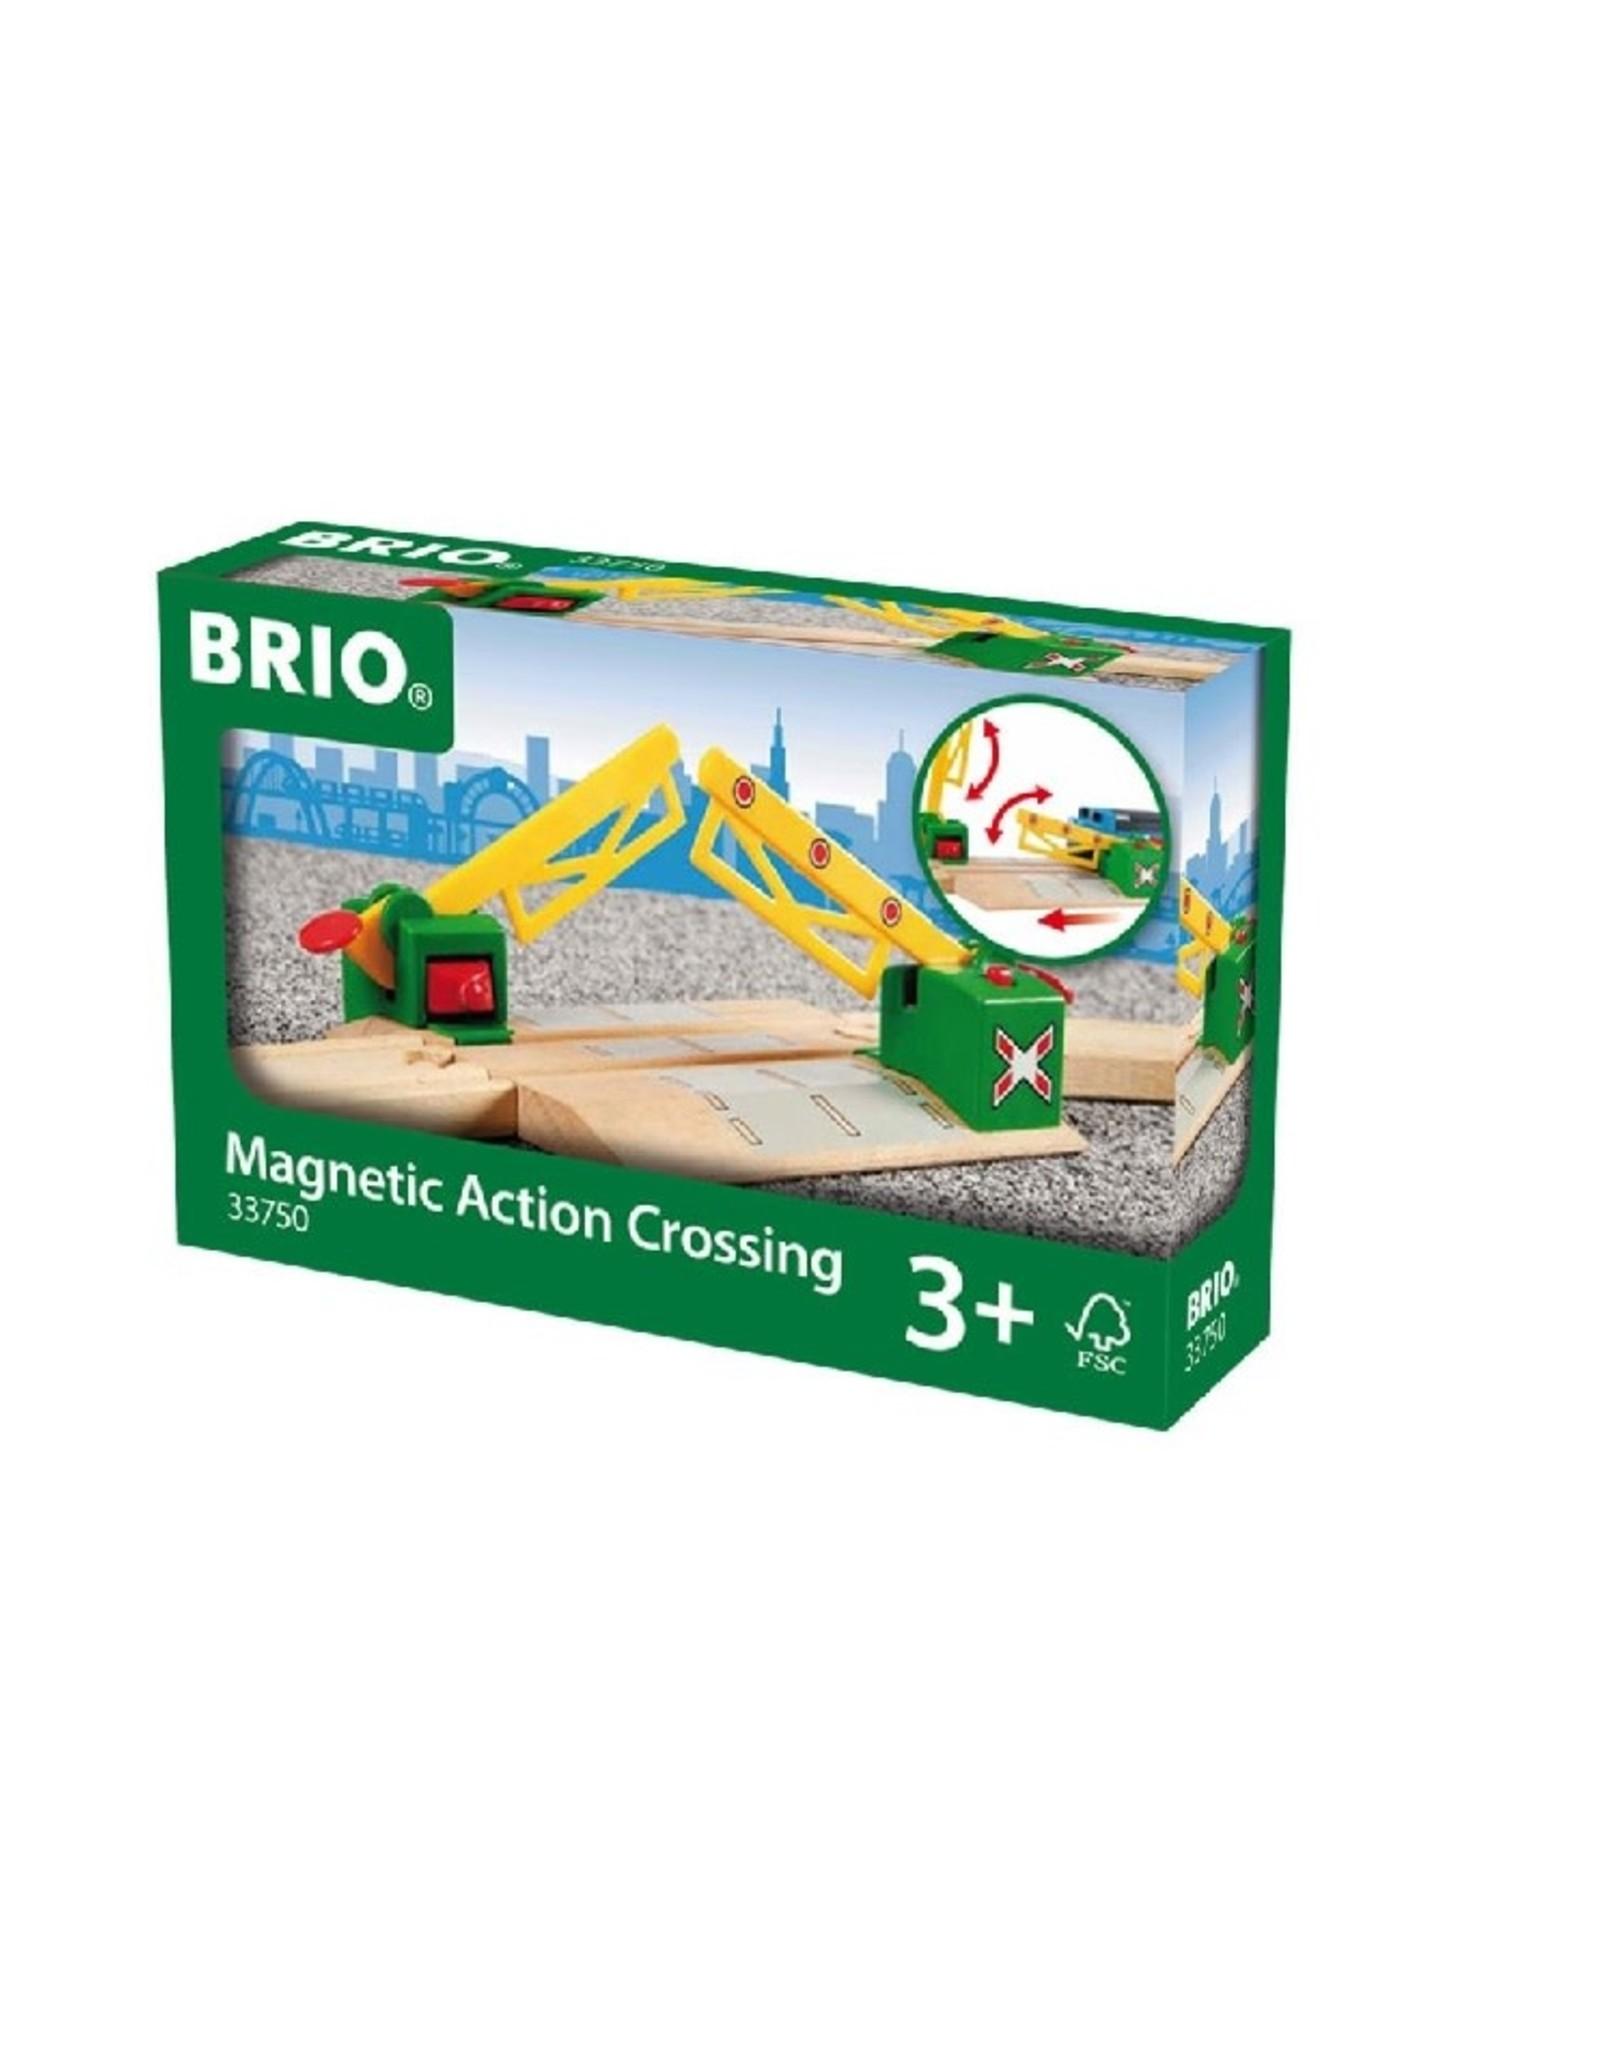 Brio Magnetic Action Crossing